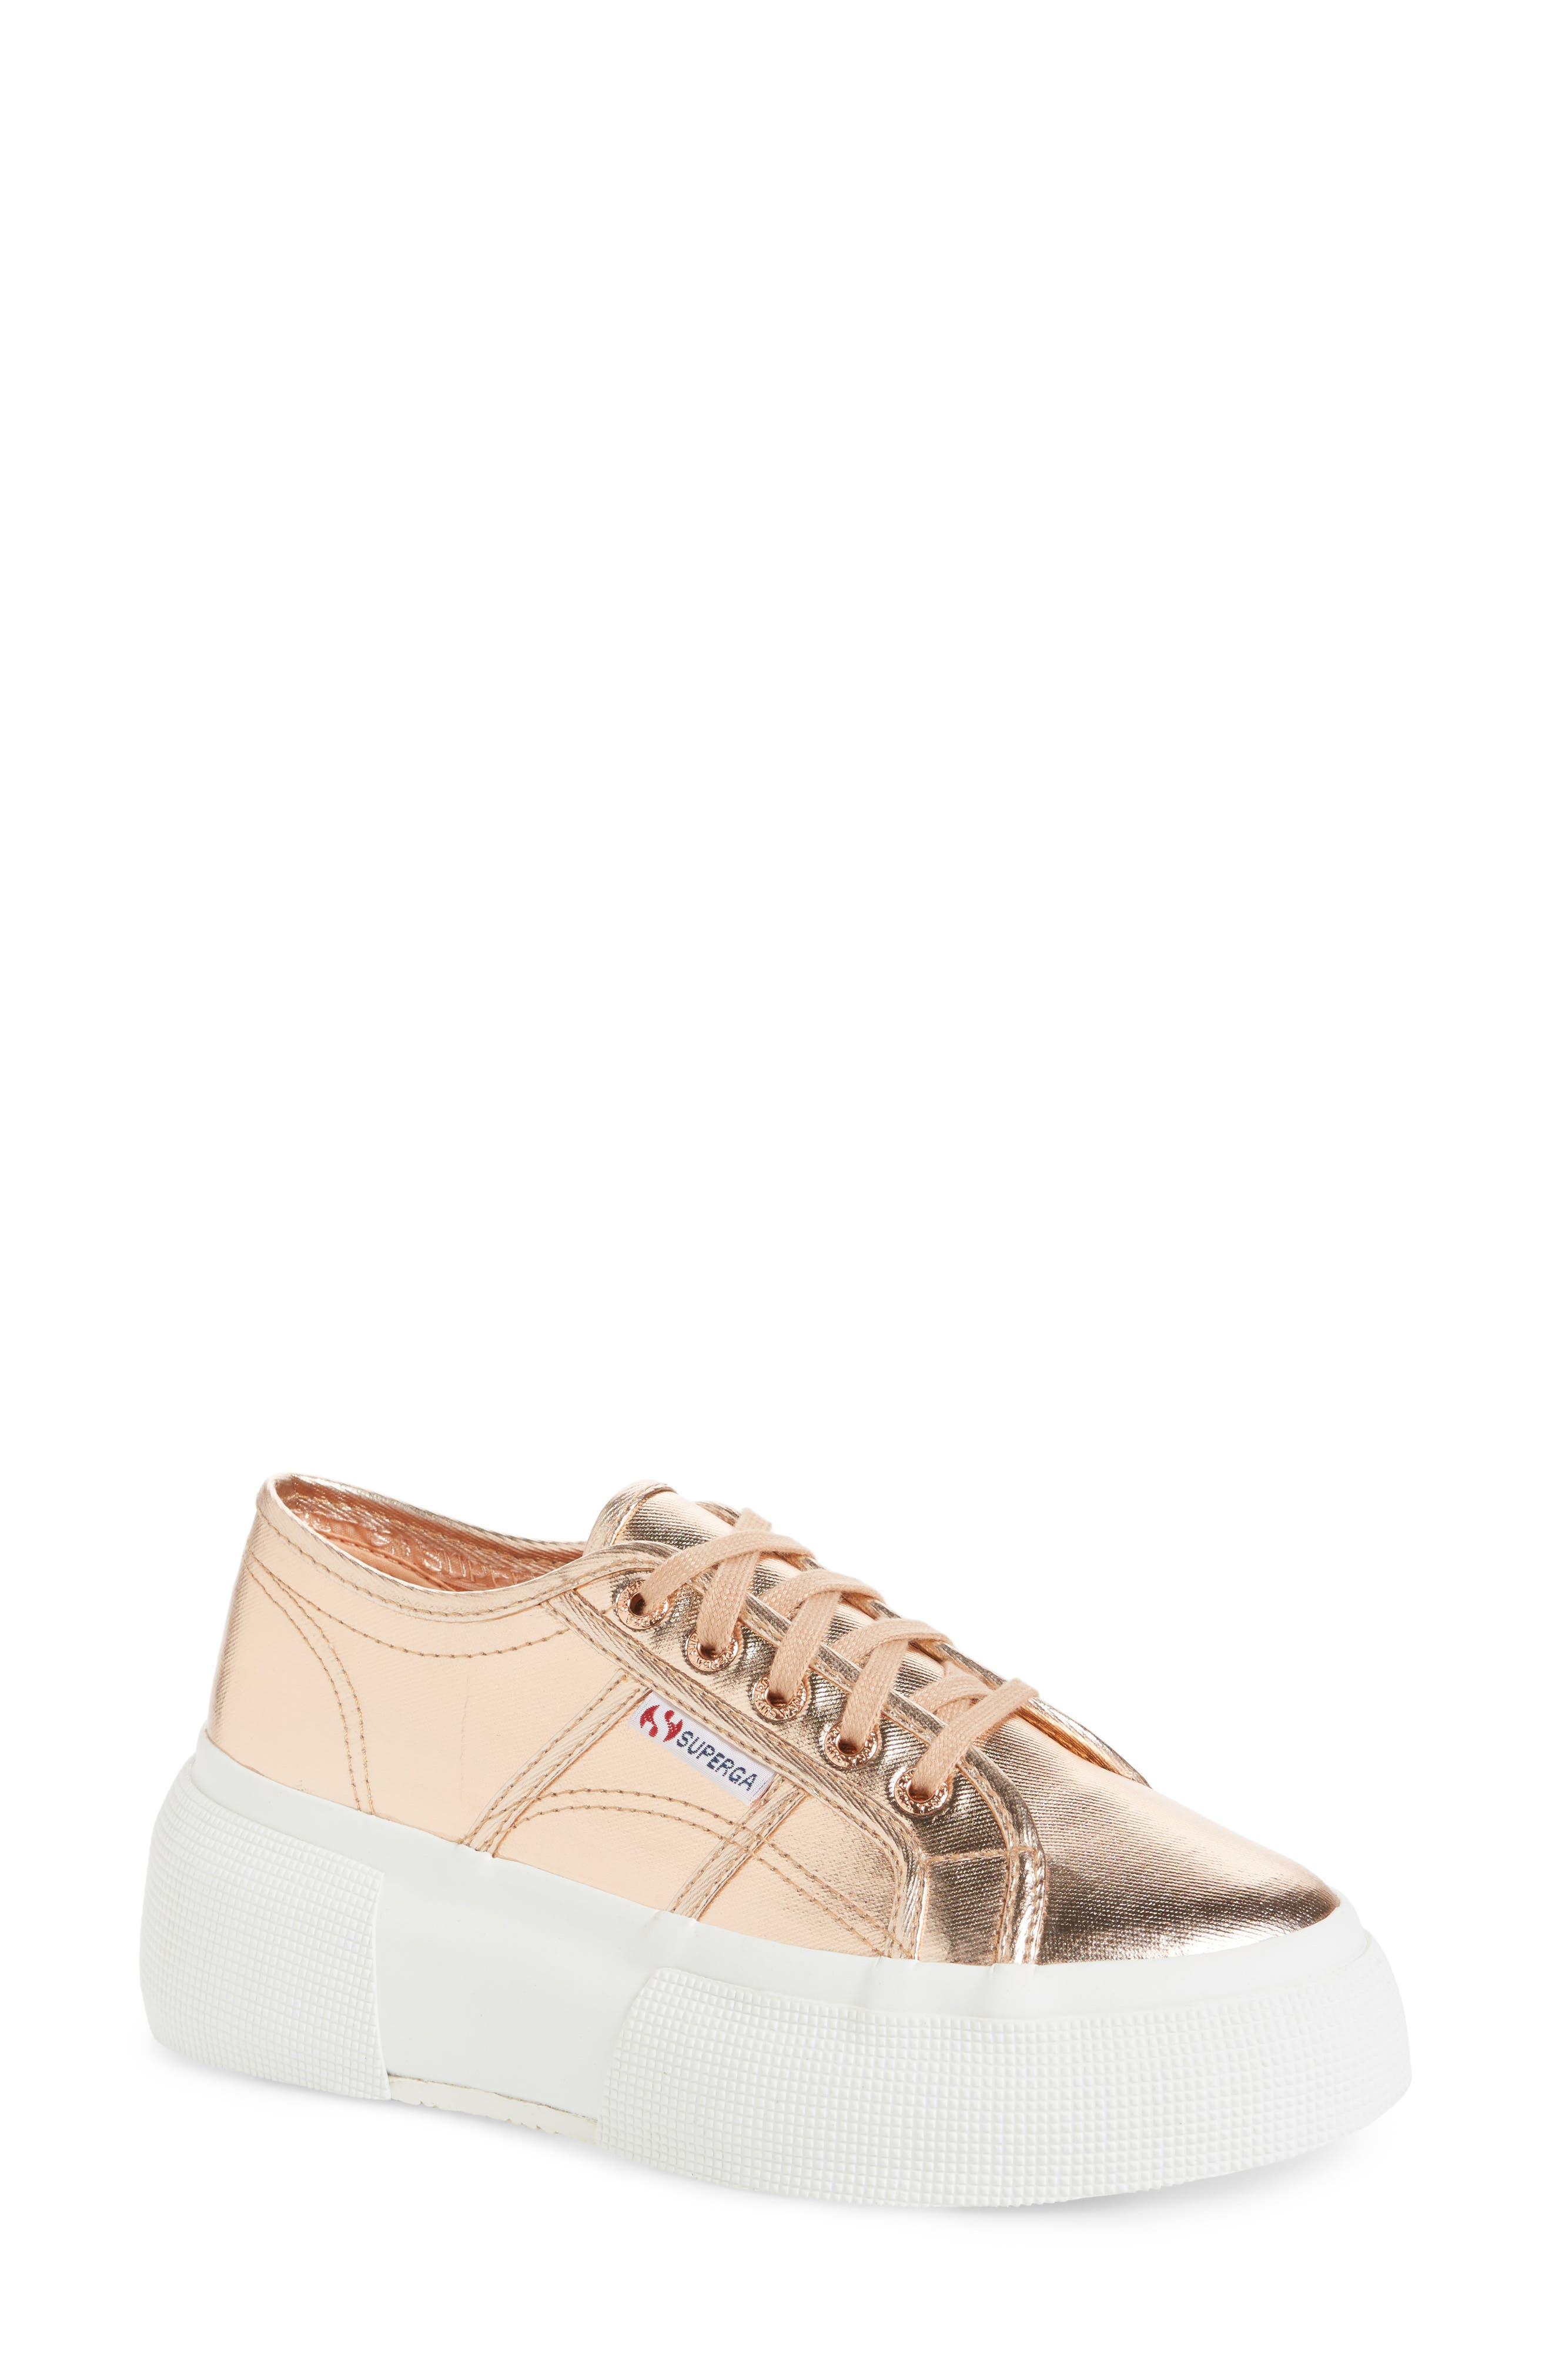 Superga 2287 Cotu Platform Sneaker (Women)